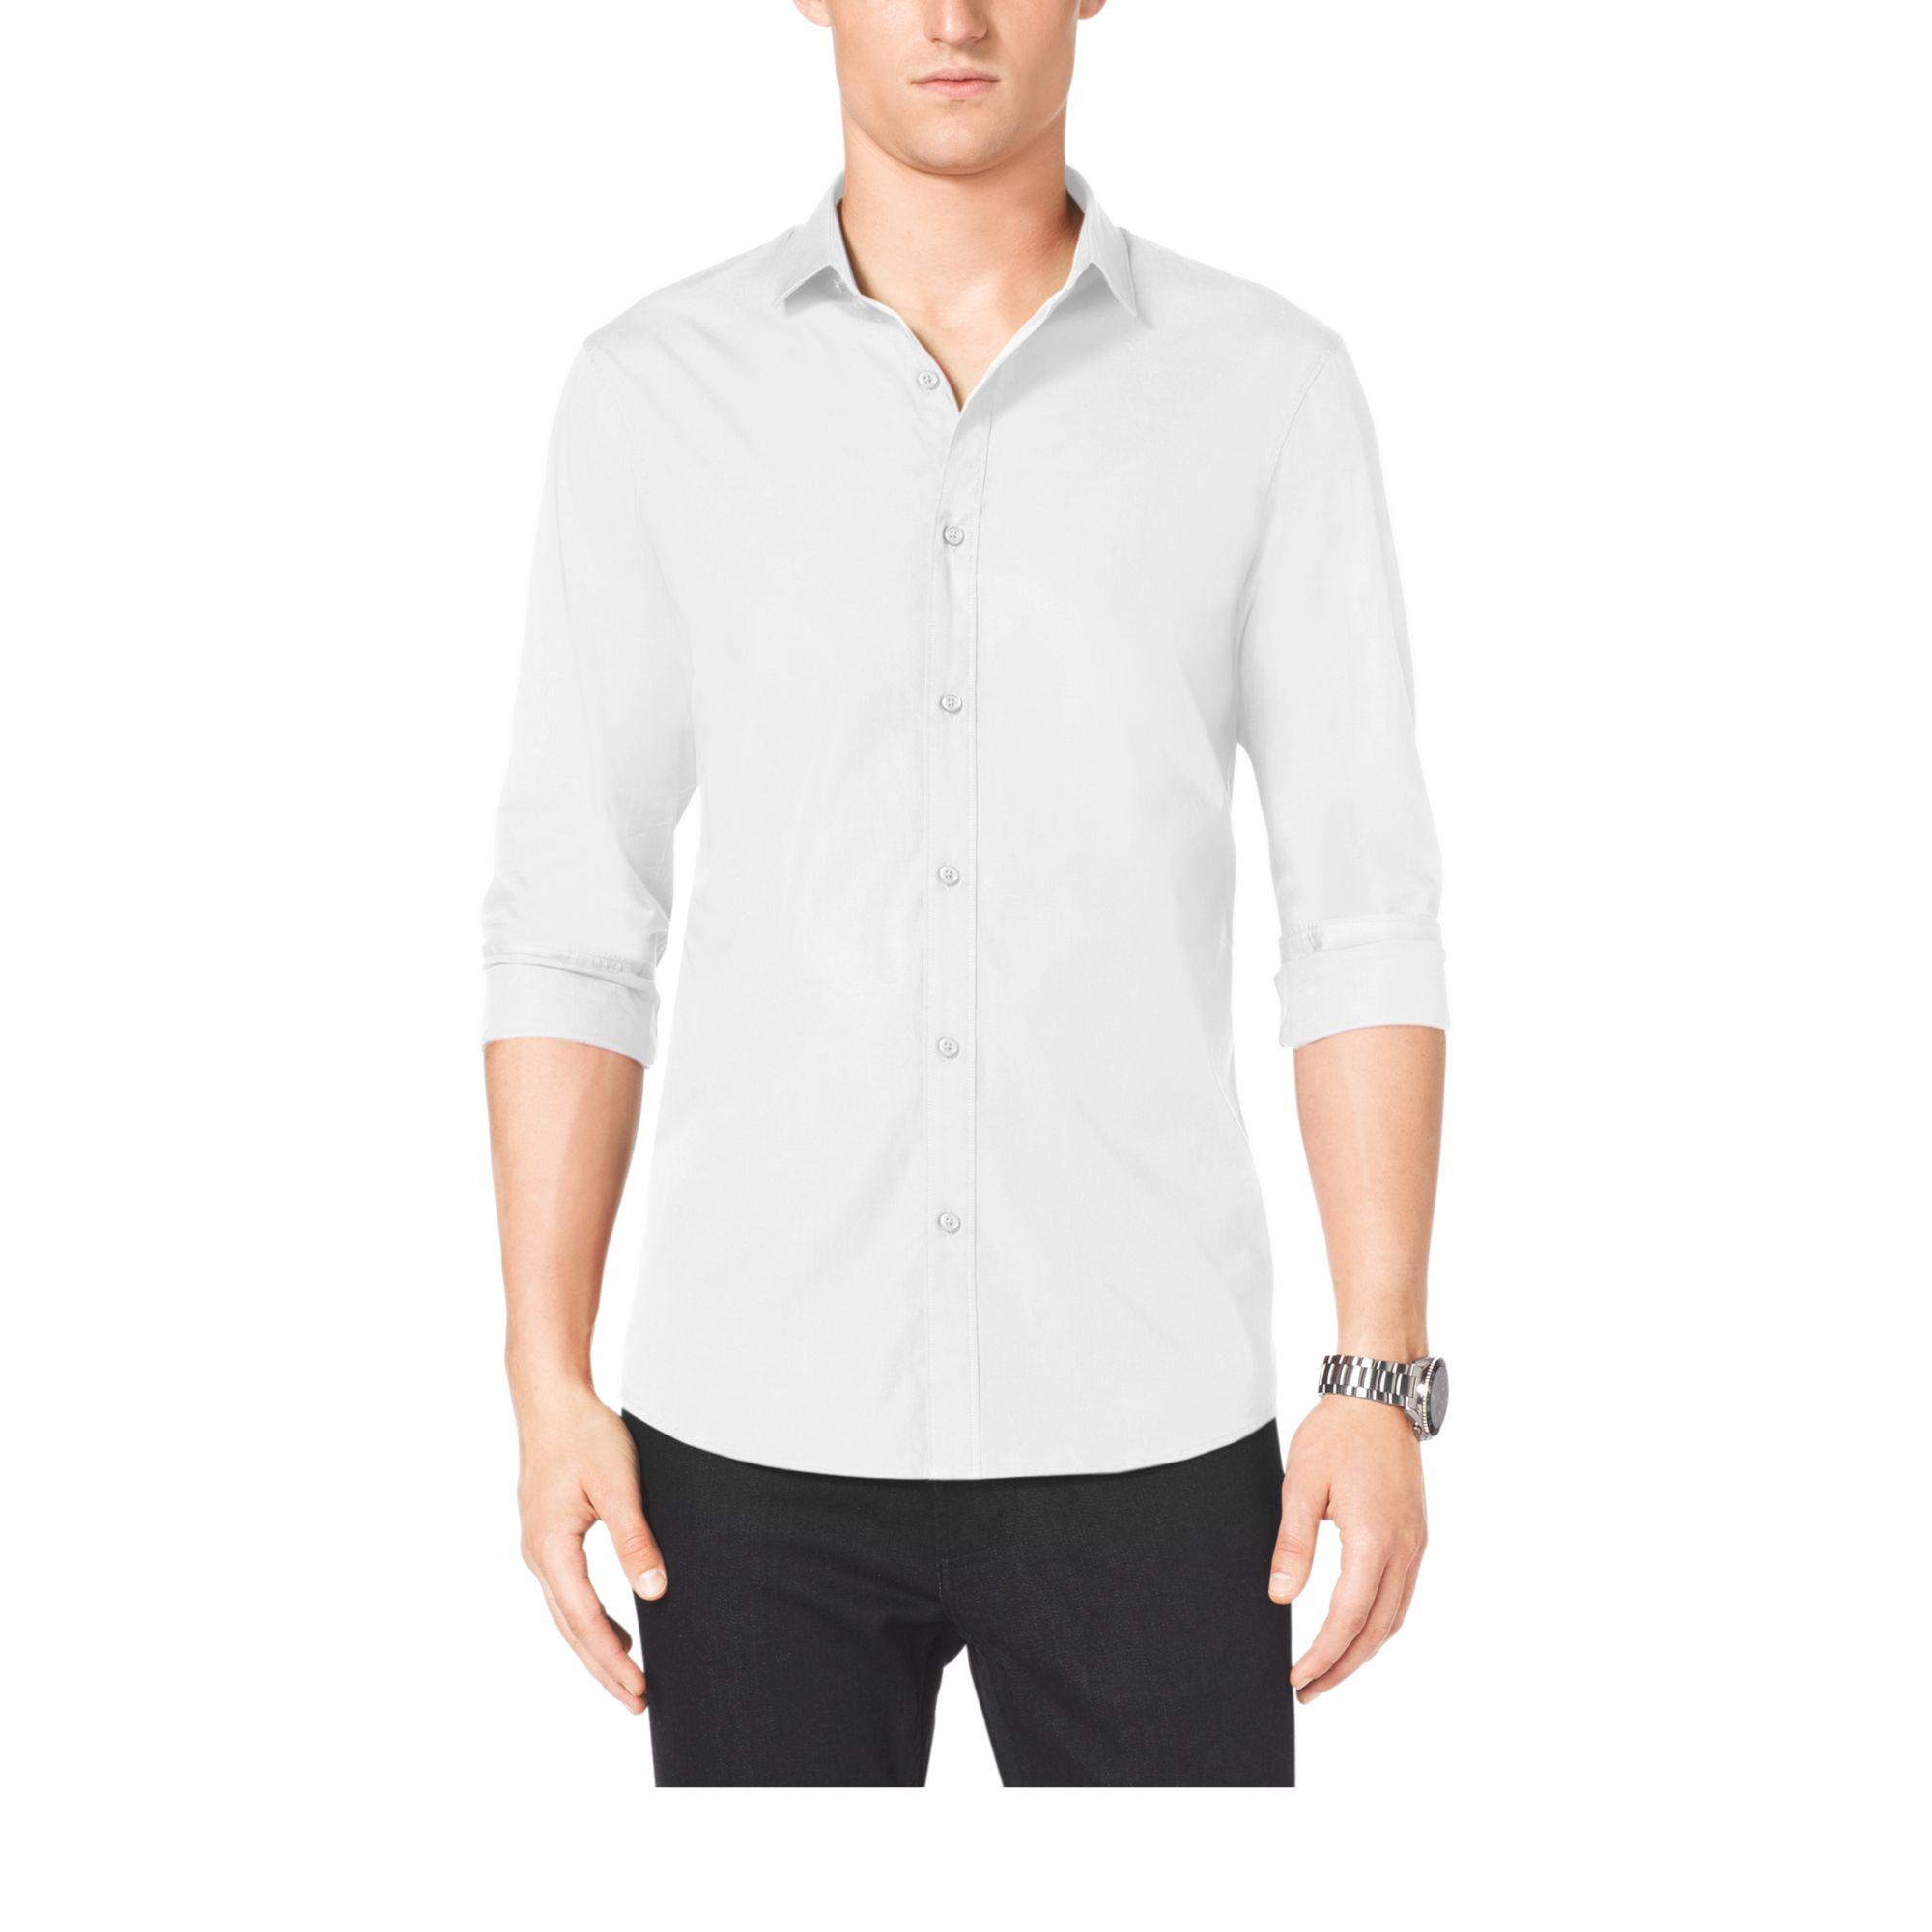 michael kors slim fit stretch cotton shirt in white for men lyst. Black Bedroom Furniture Sets. Home Design Ideas